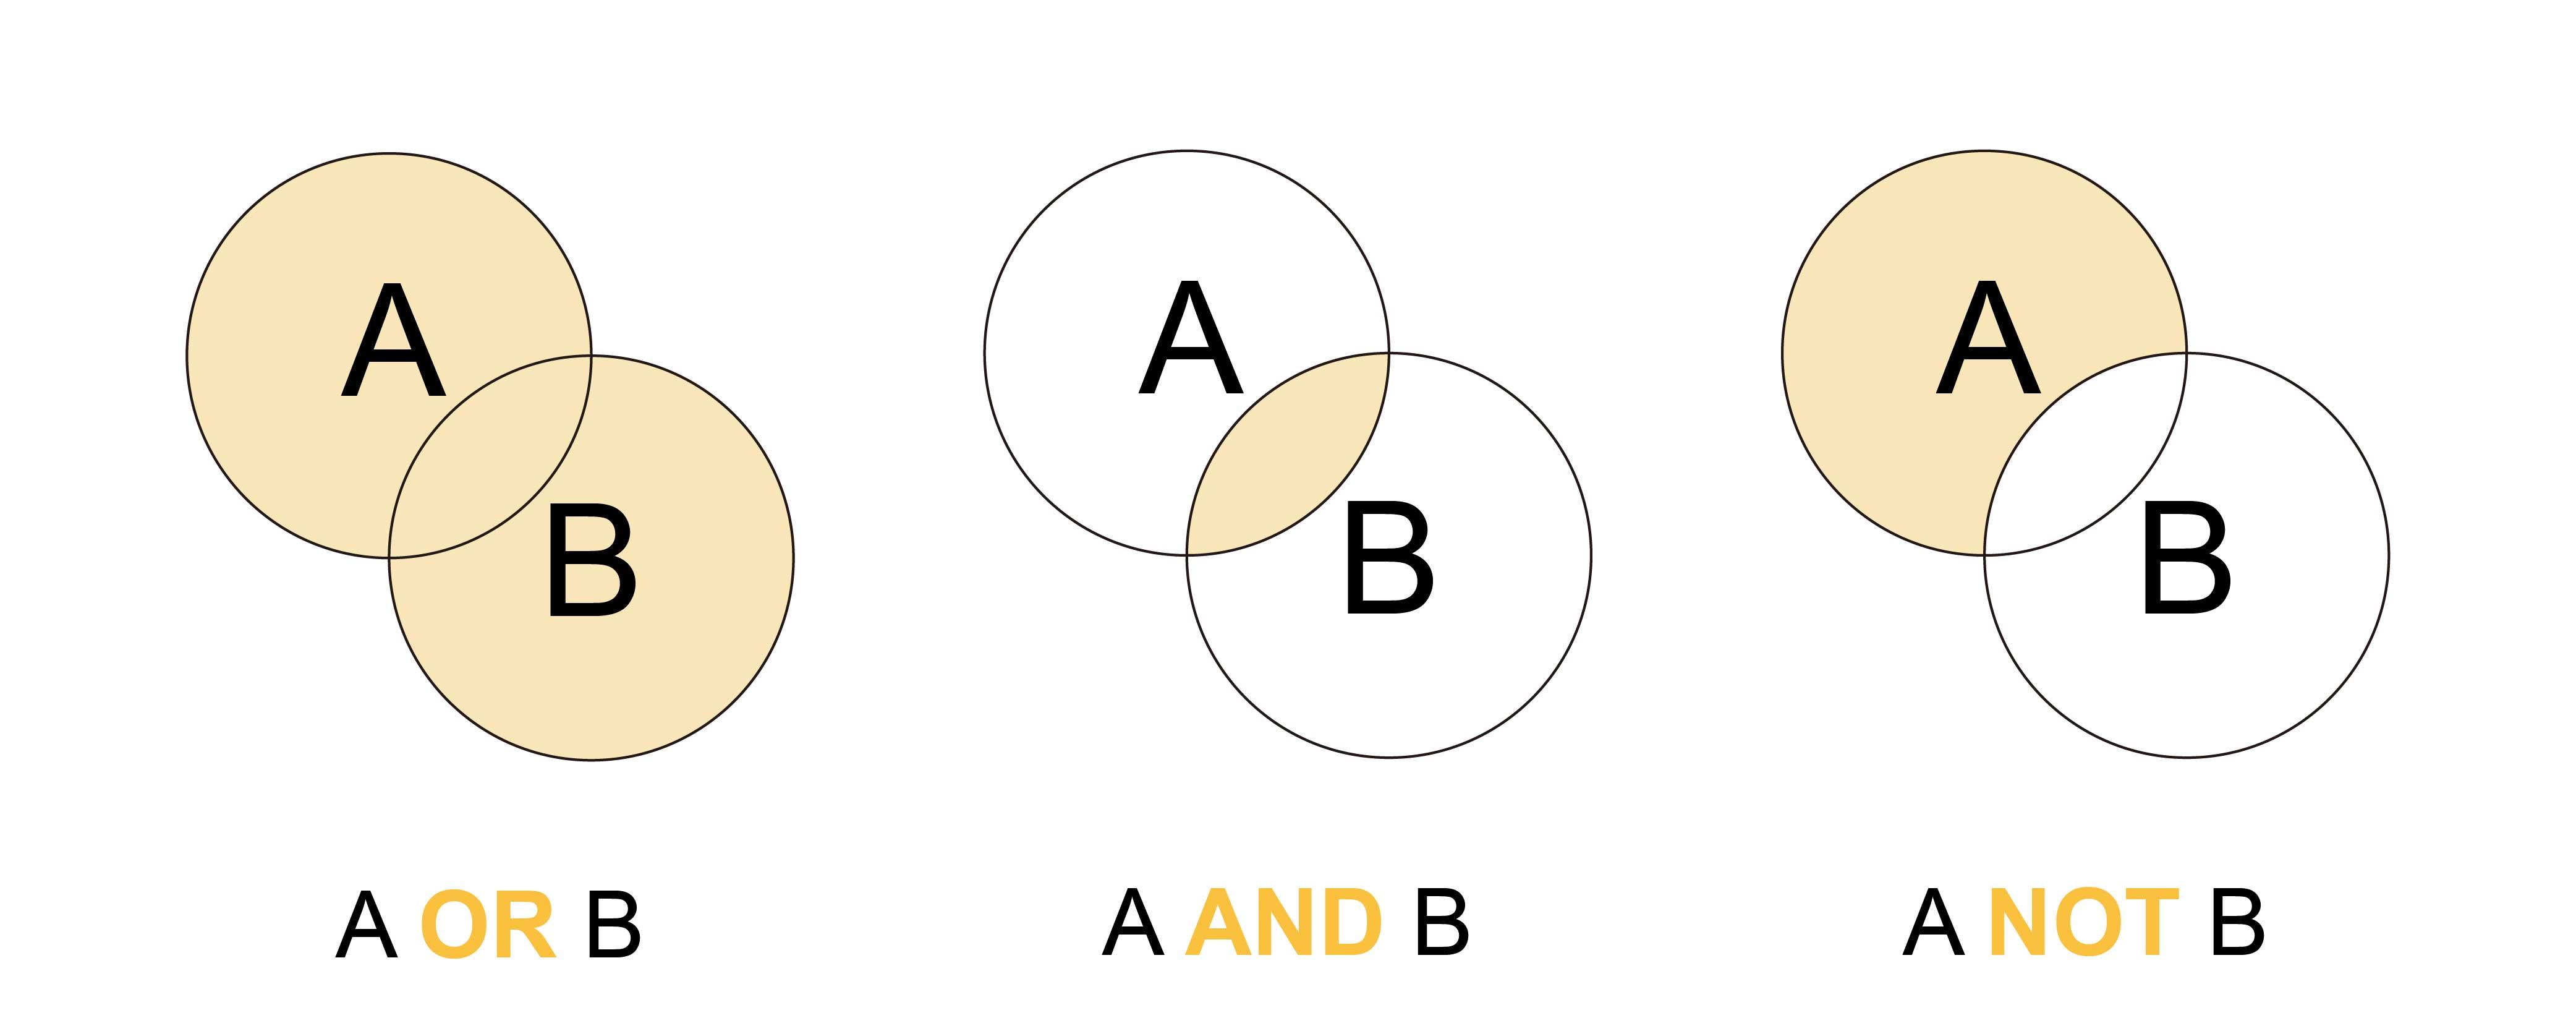 and、or、not 的邏輯概念,也是電子電路、電腦程式碼的基礎。 圖│研之有物